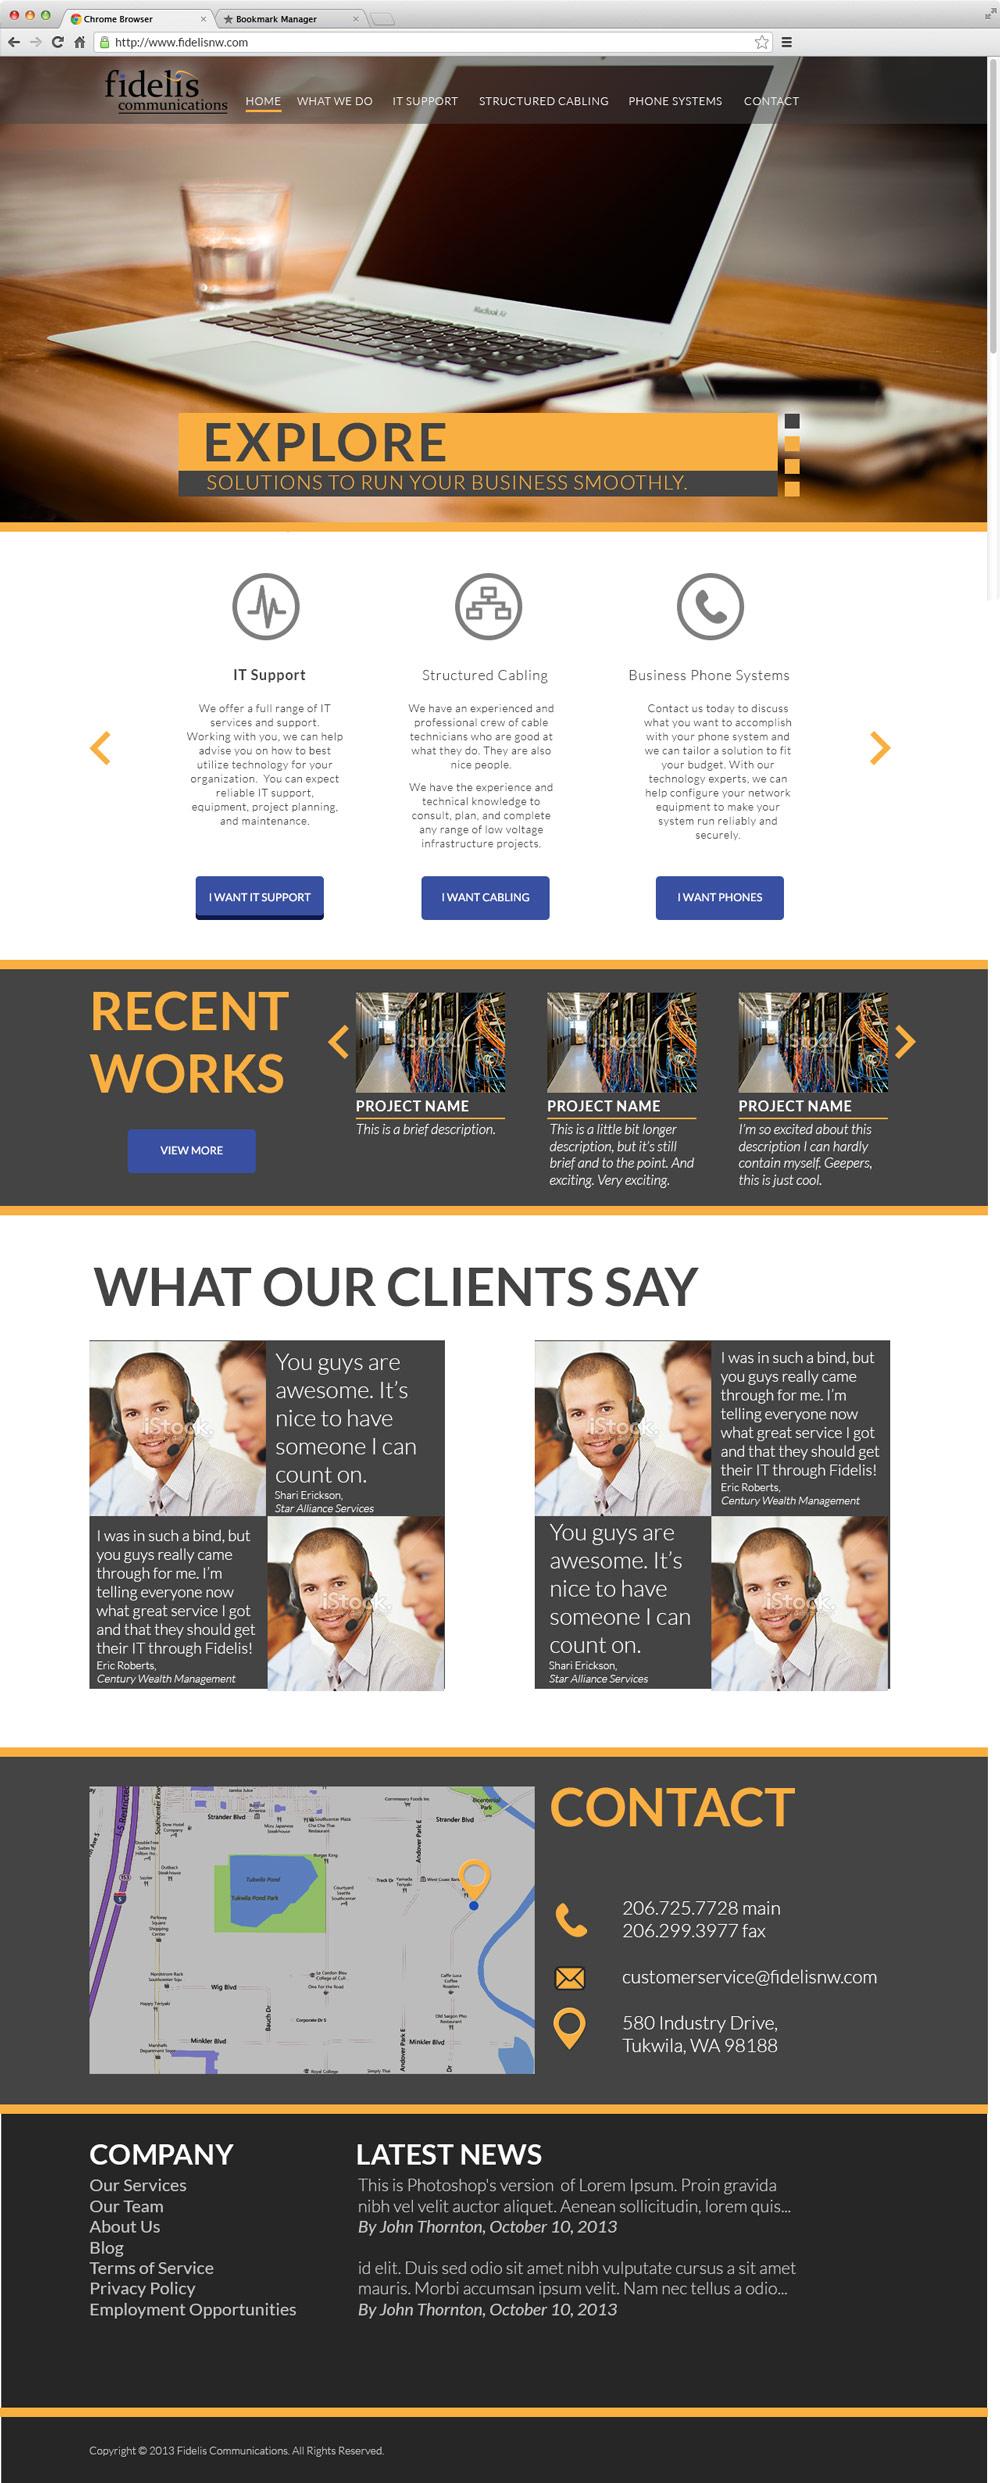 ben-pingel-Web-design-fidelis-nw